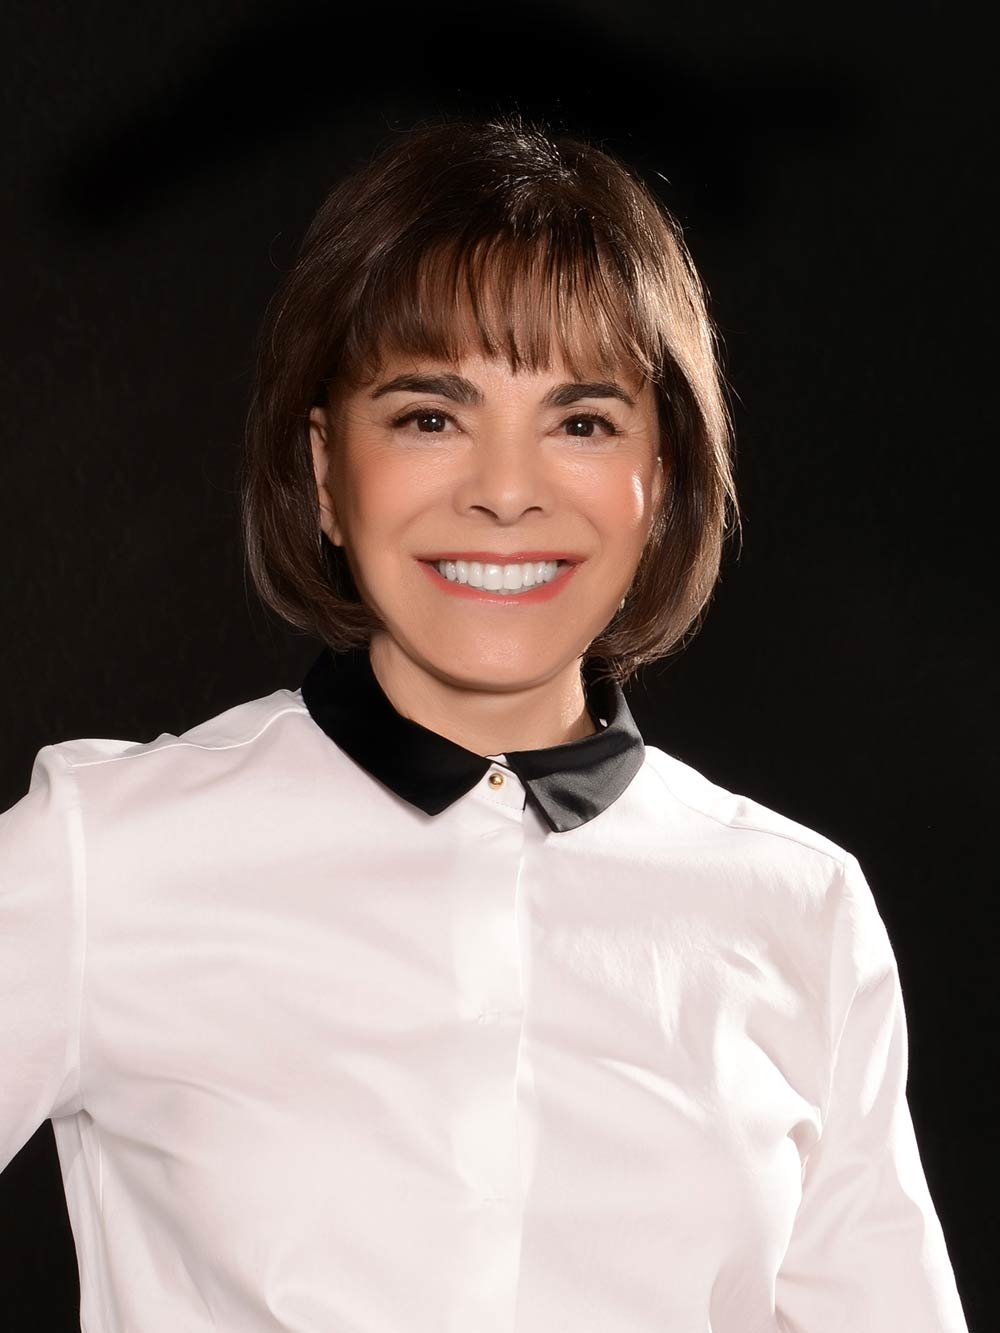 Joan Levinson